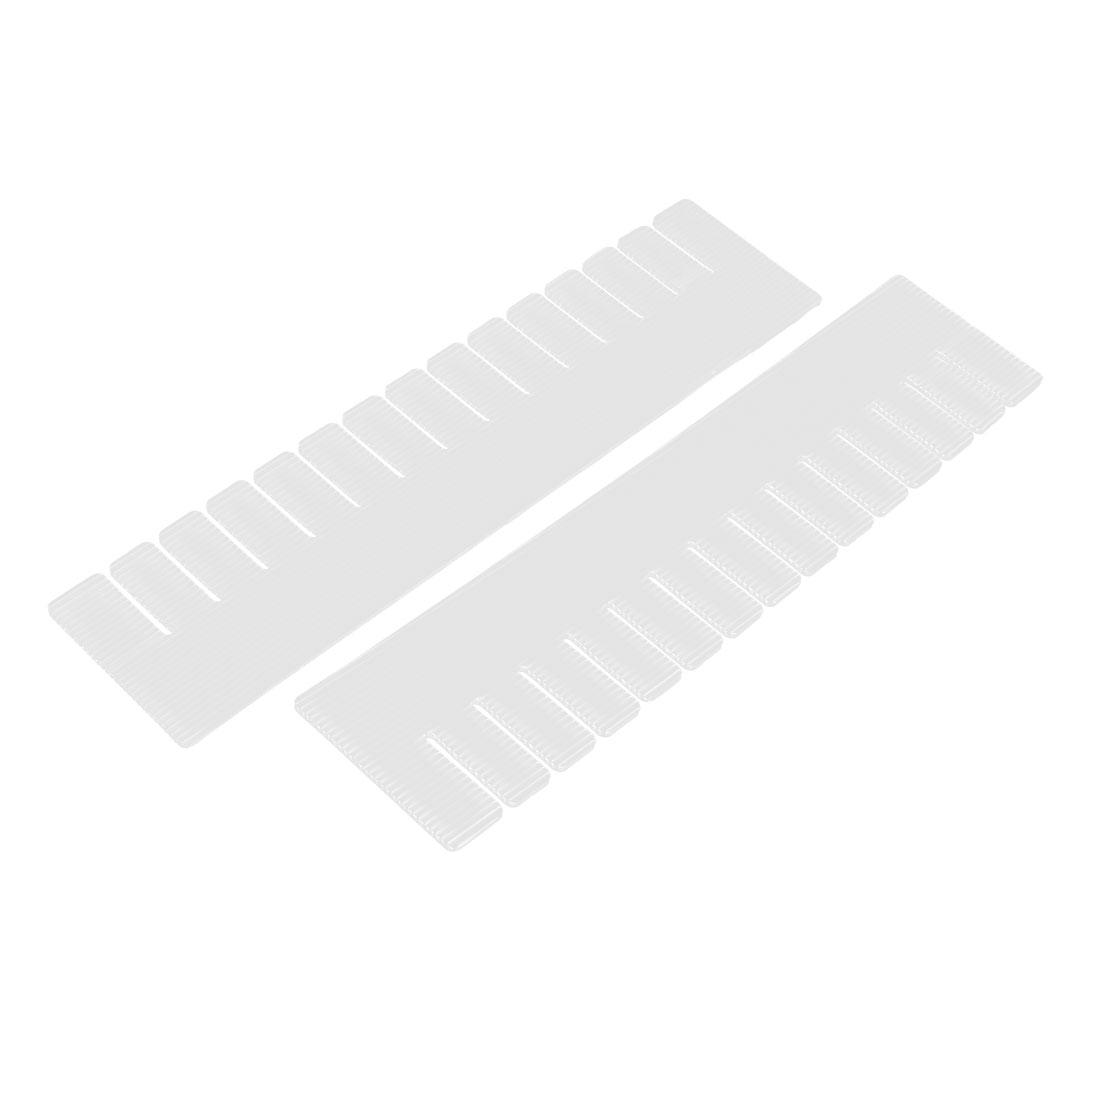 Plastic Adjustable Clothes Storage Box Drawer Divider Board Organizer White